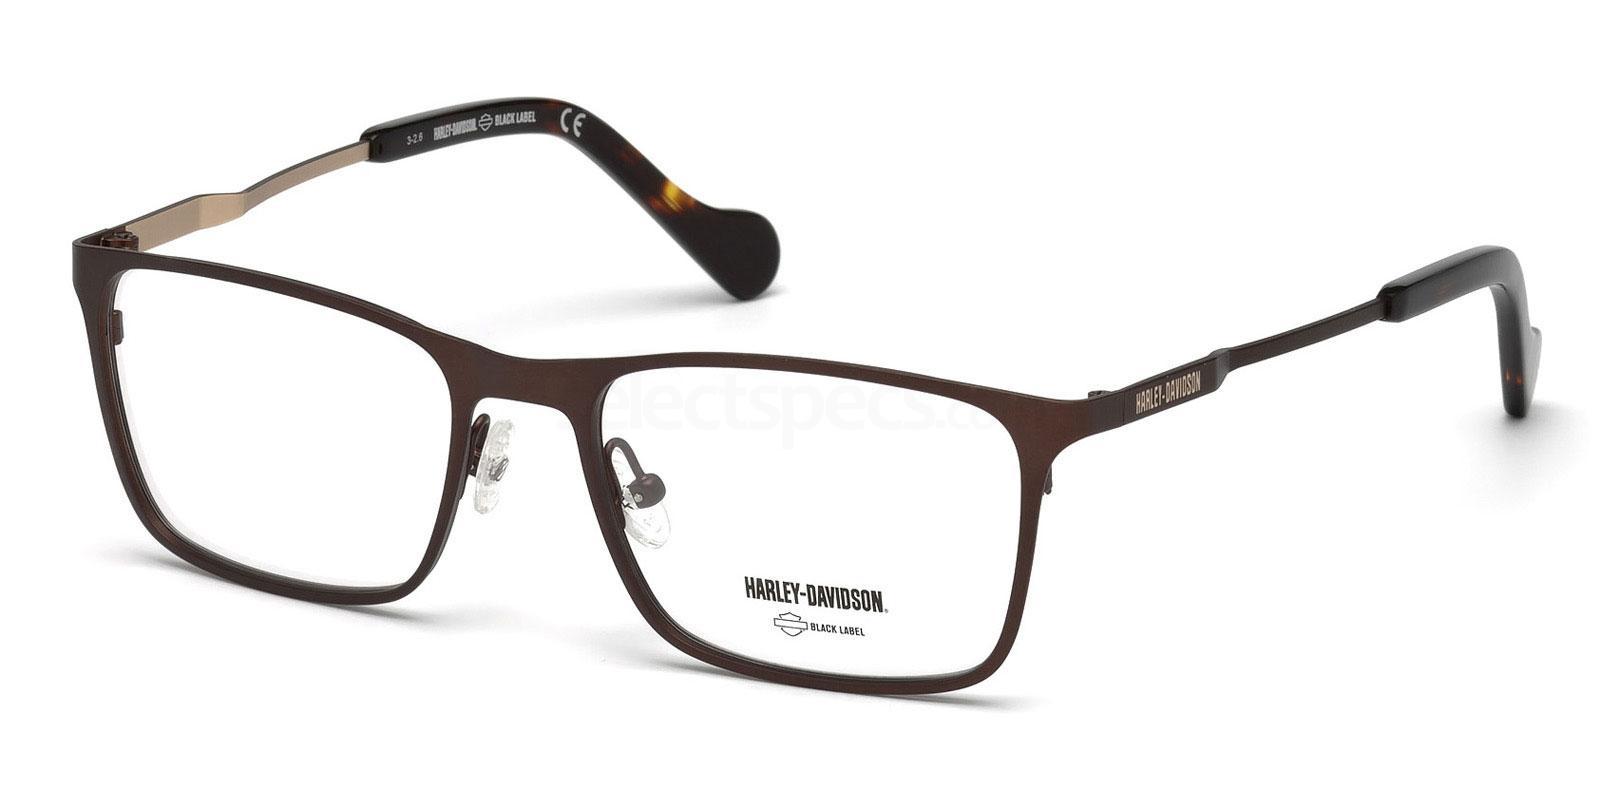 050 HD1042 Glasses, Harley Davidson